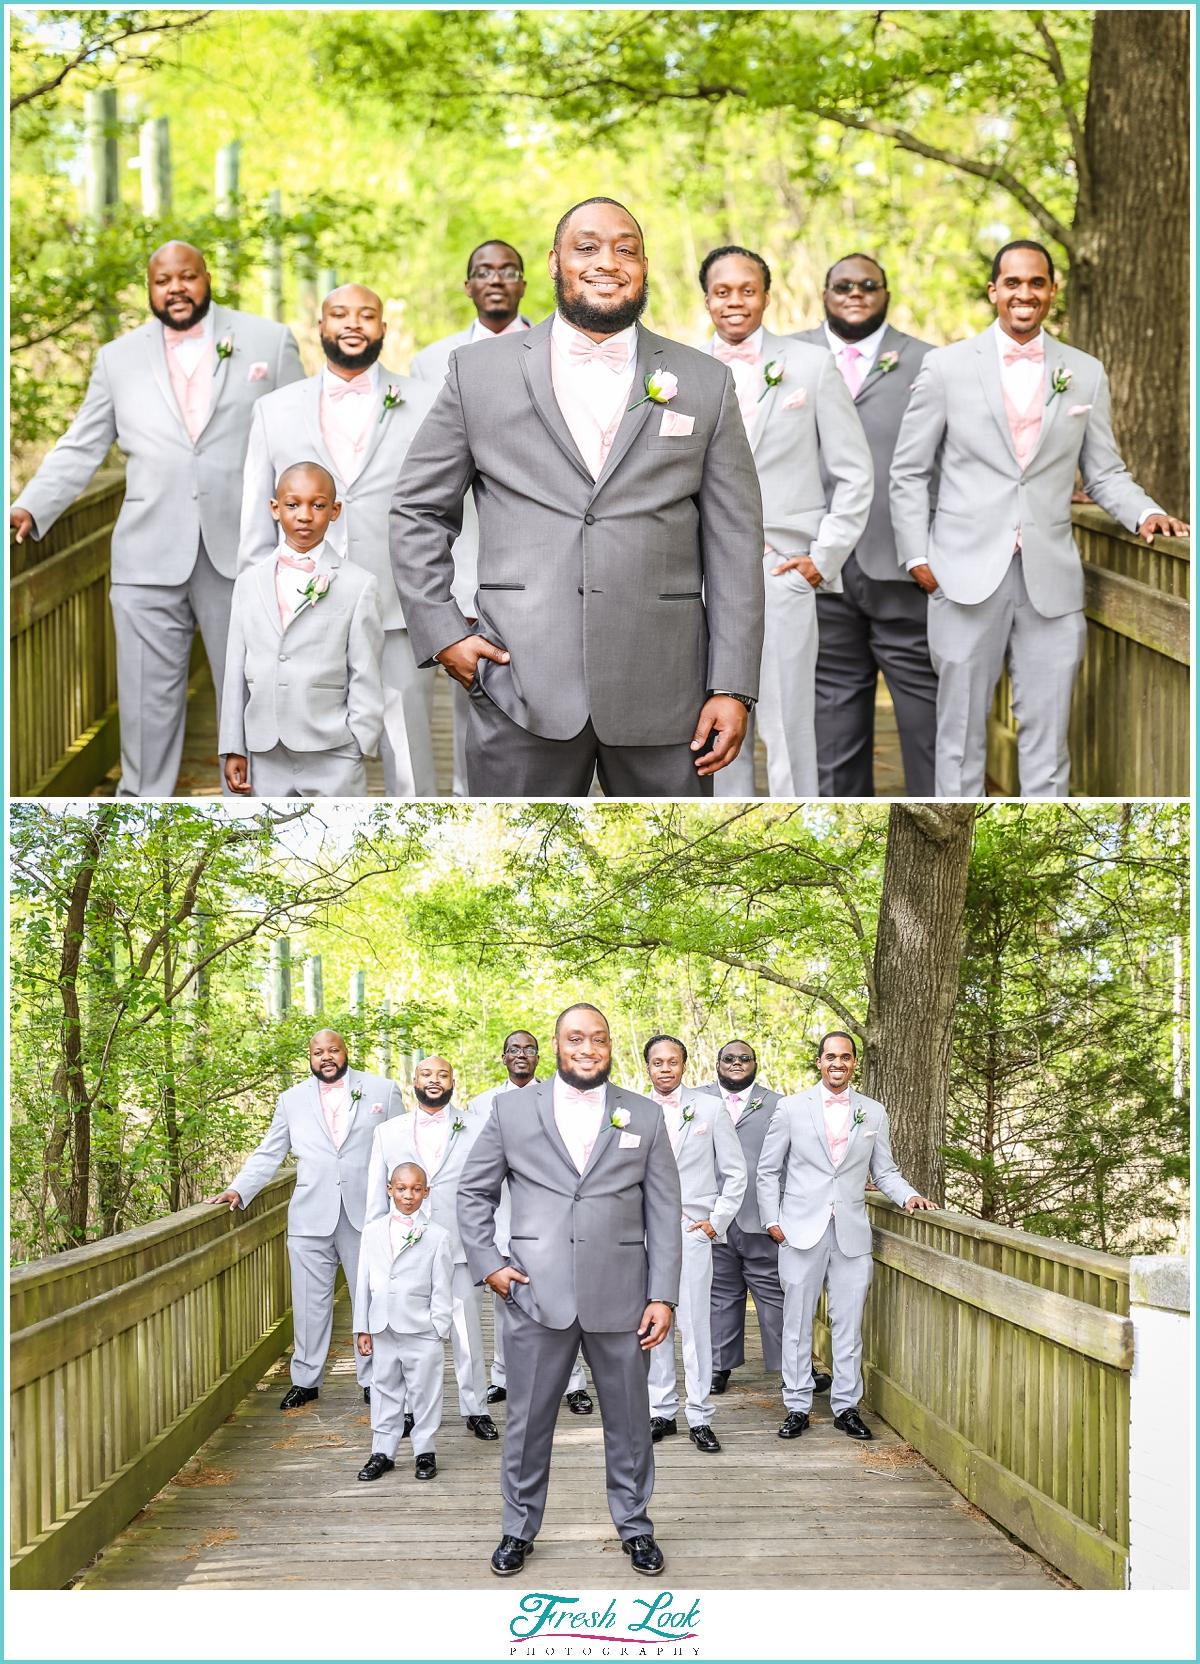 Groomsmen wearing gray suits